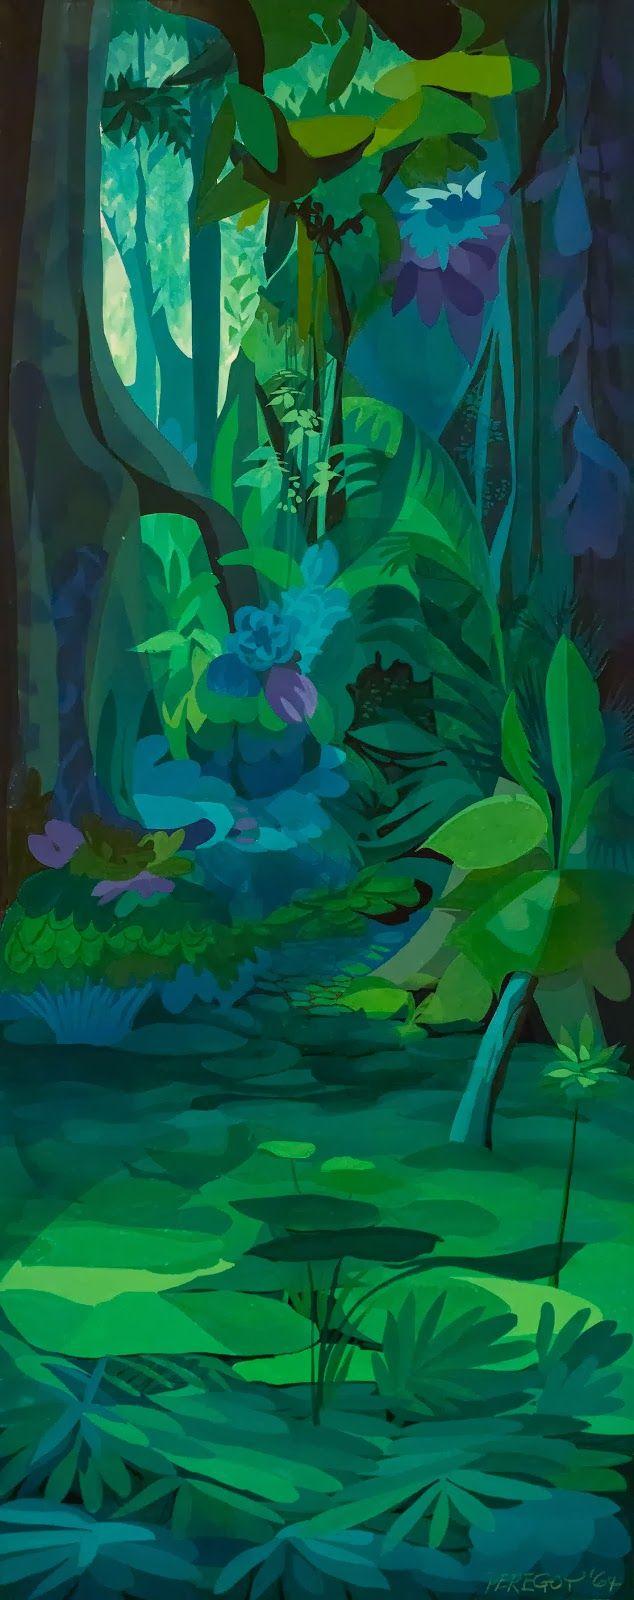 Walt Peregoy's Jungle Book (Deja View)